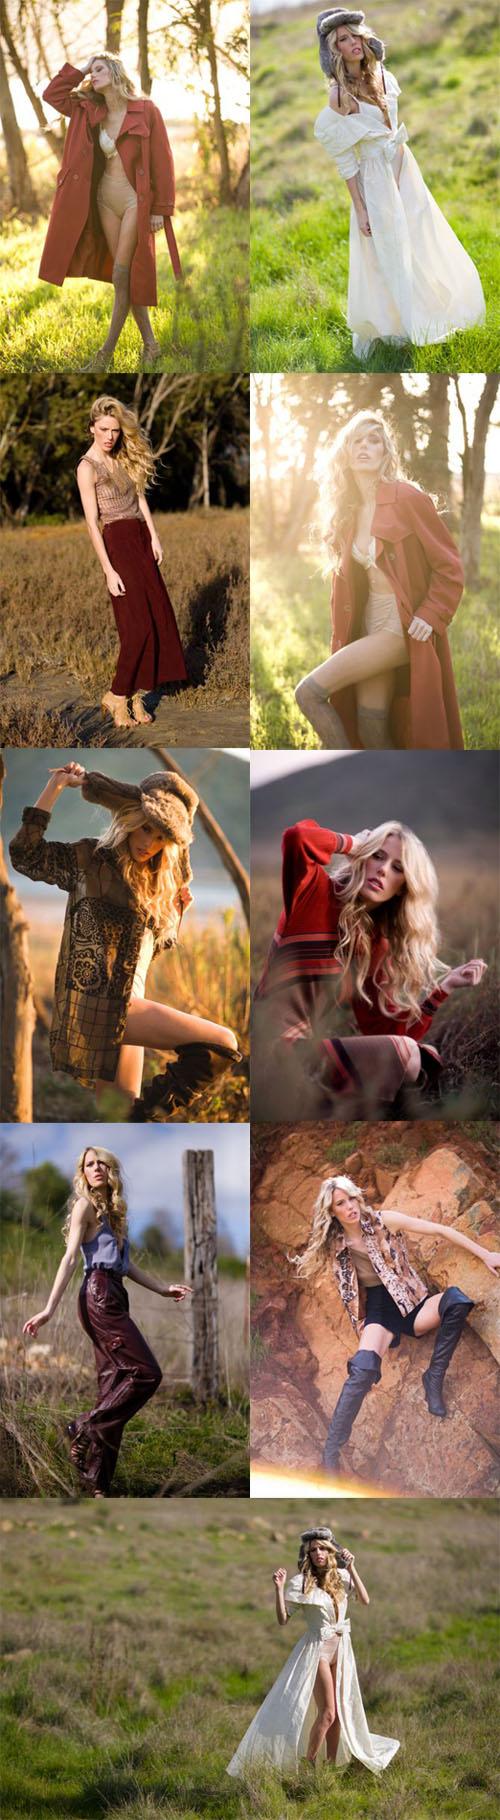 Female model photo shoot of Chesley Carele Stylist in San Diego